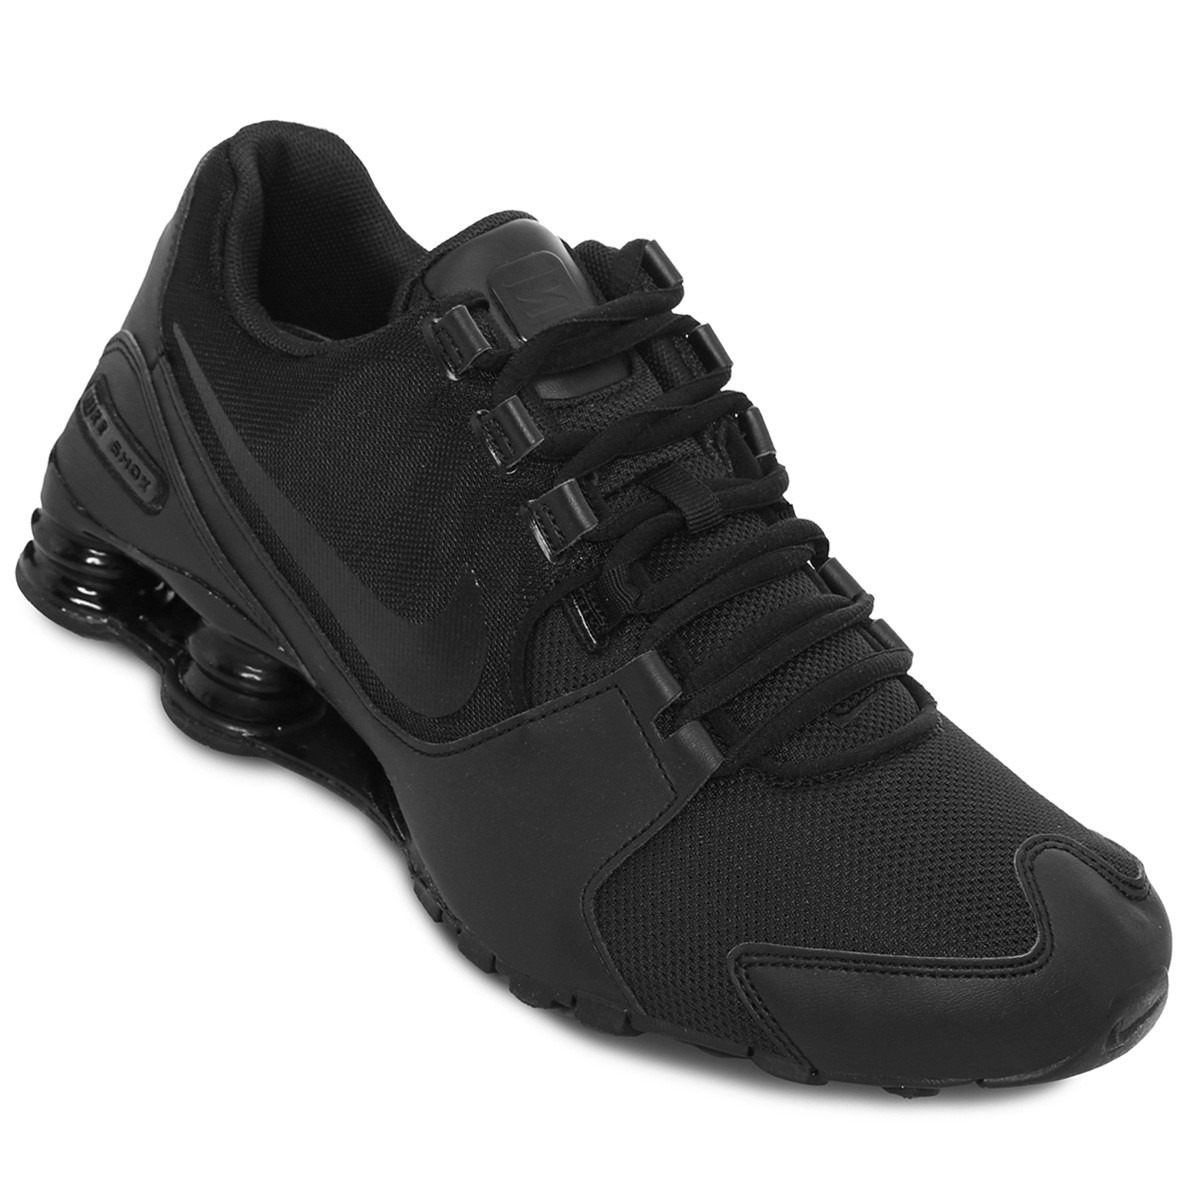 reputable site 70317 be2a8 New Zapatillas Nike Modelo Shox 2017 Original A Todo El Perú